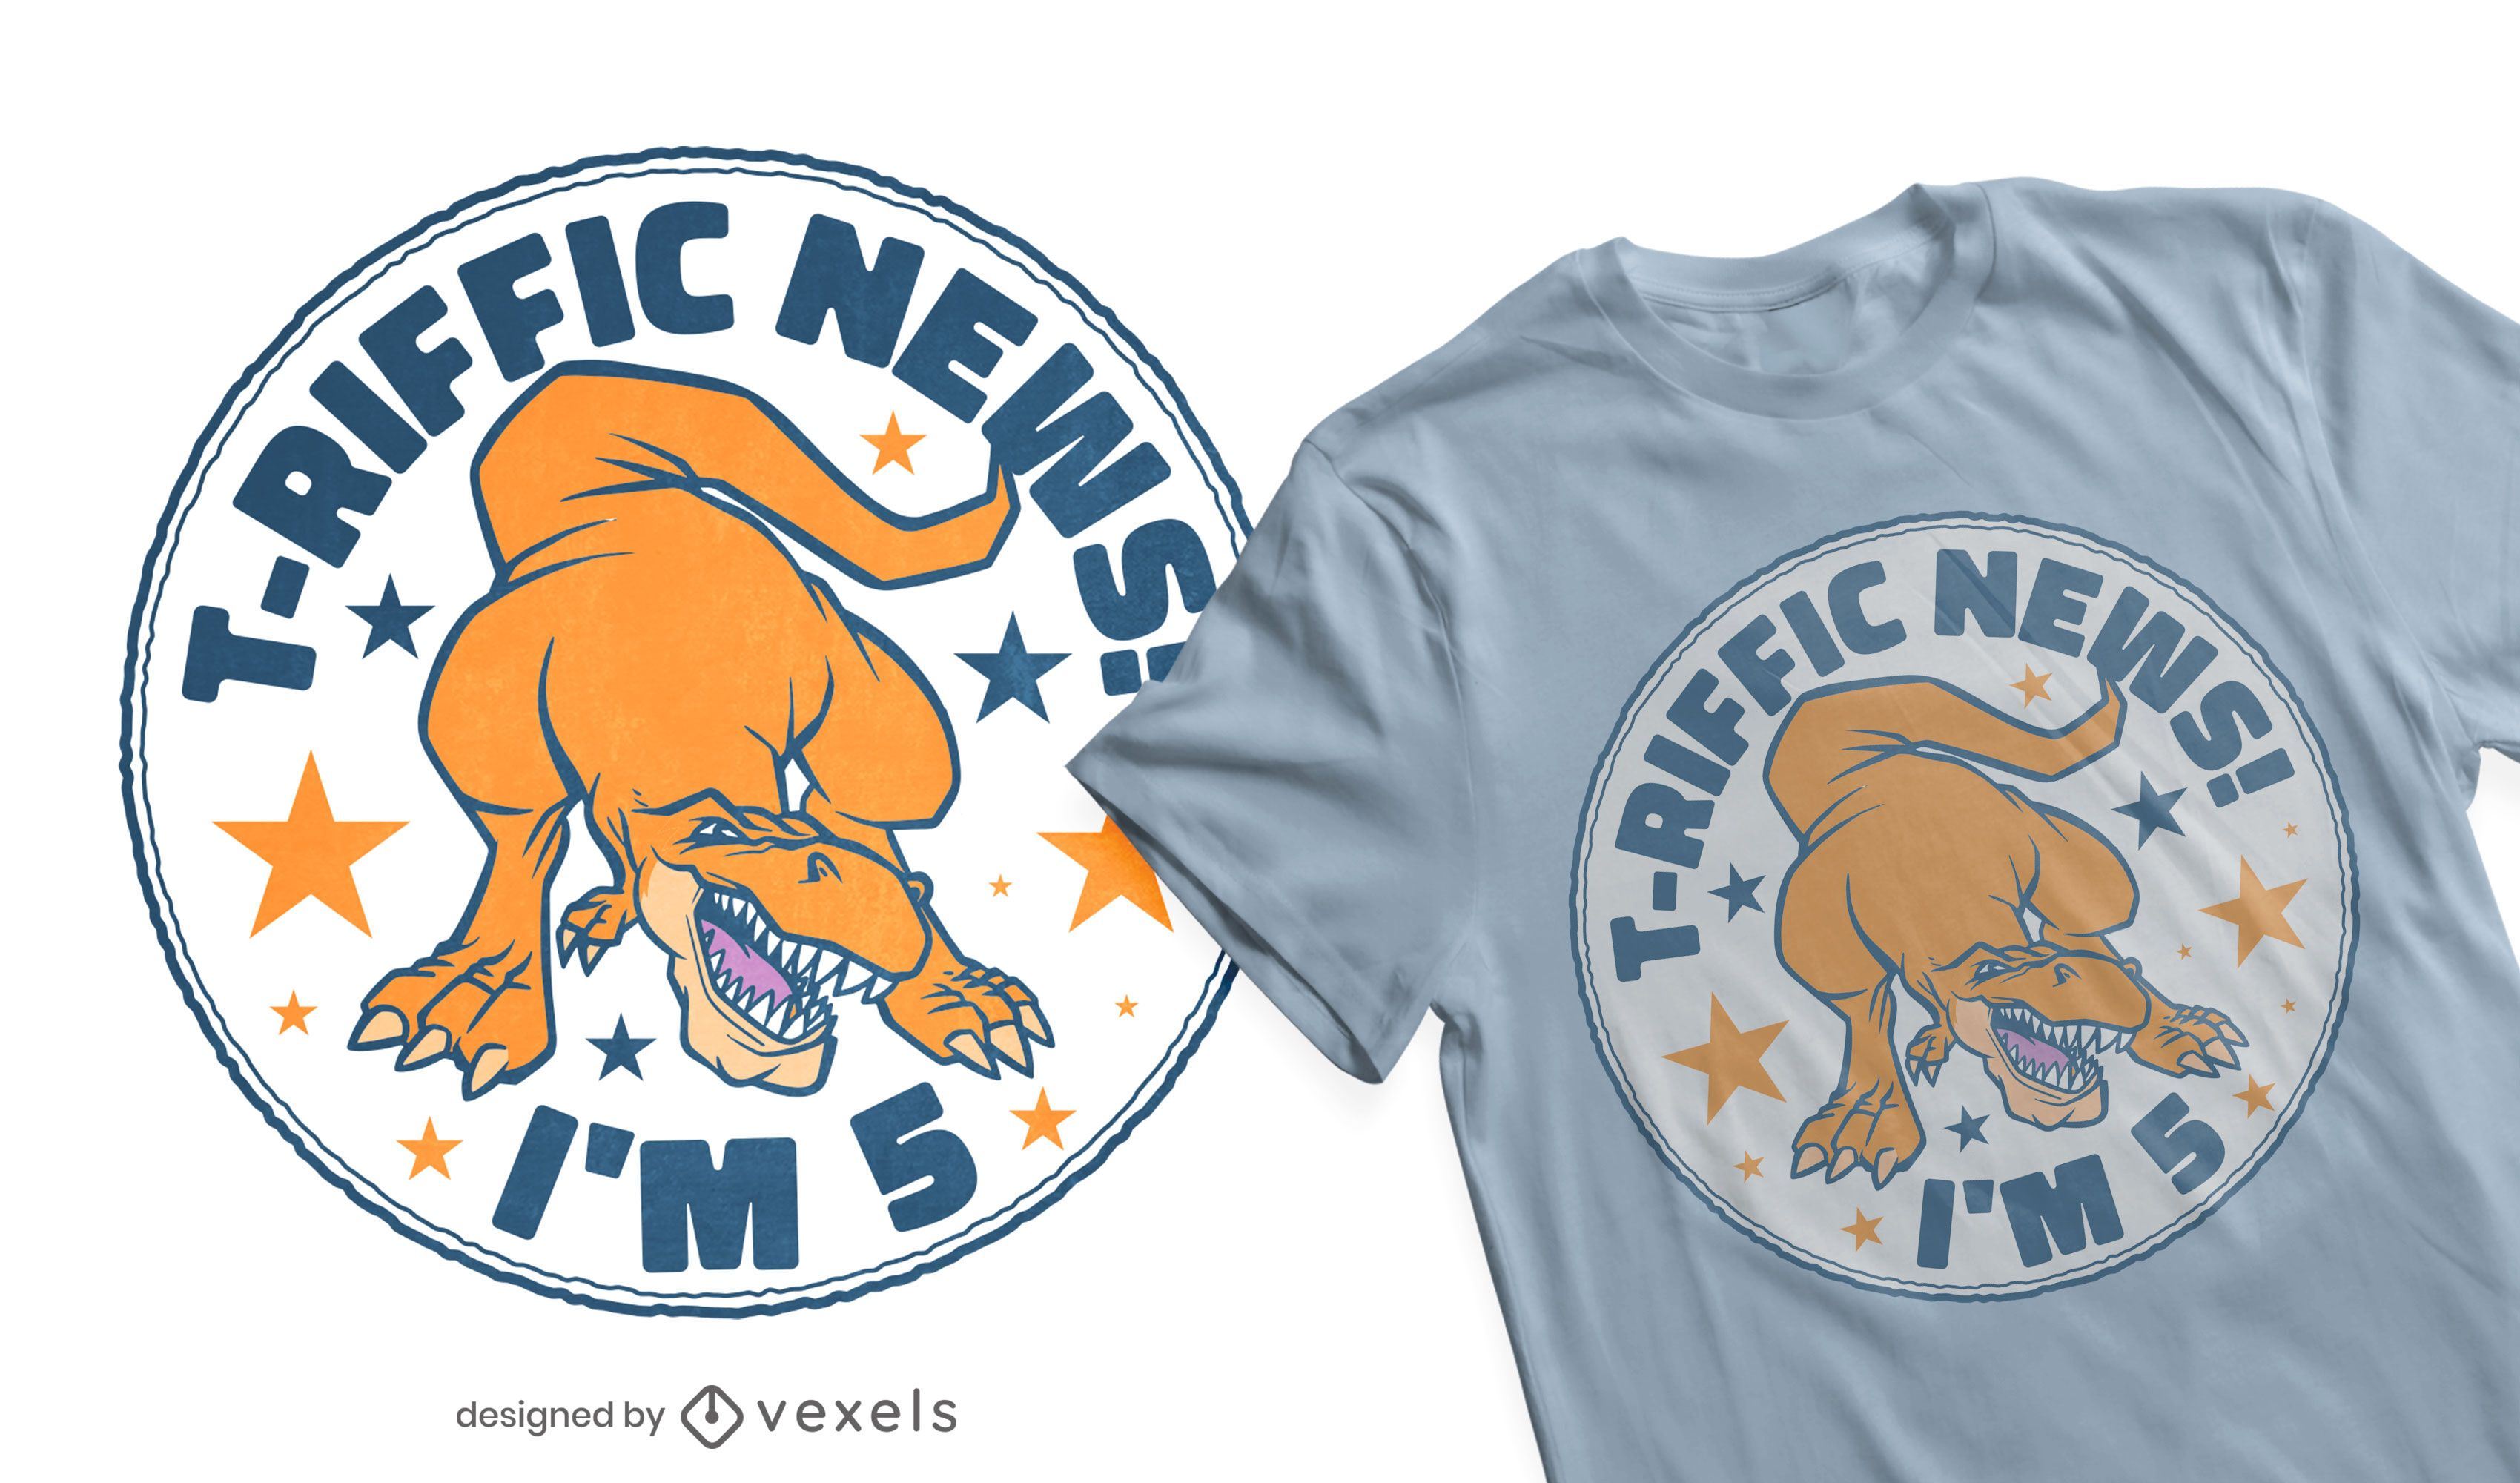 T-riffic birthday t-shirt design